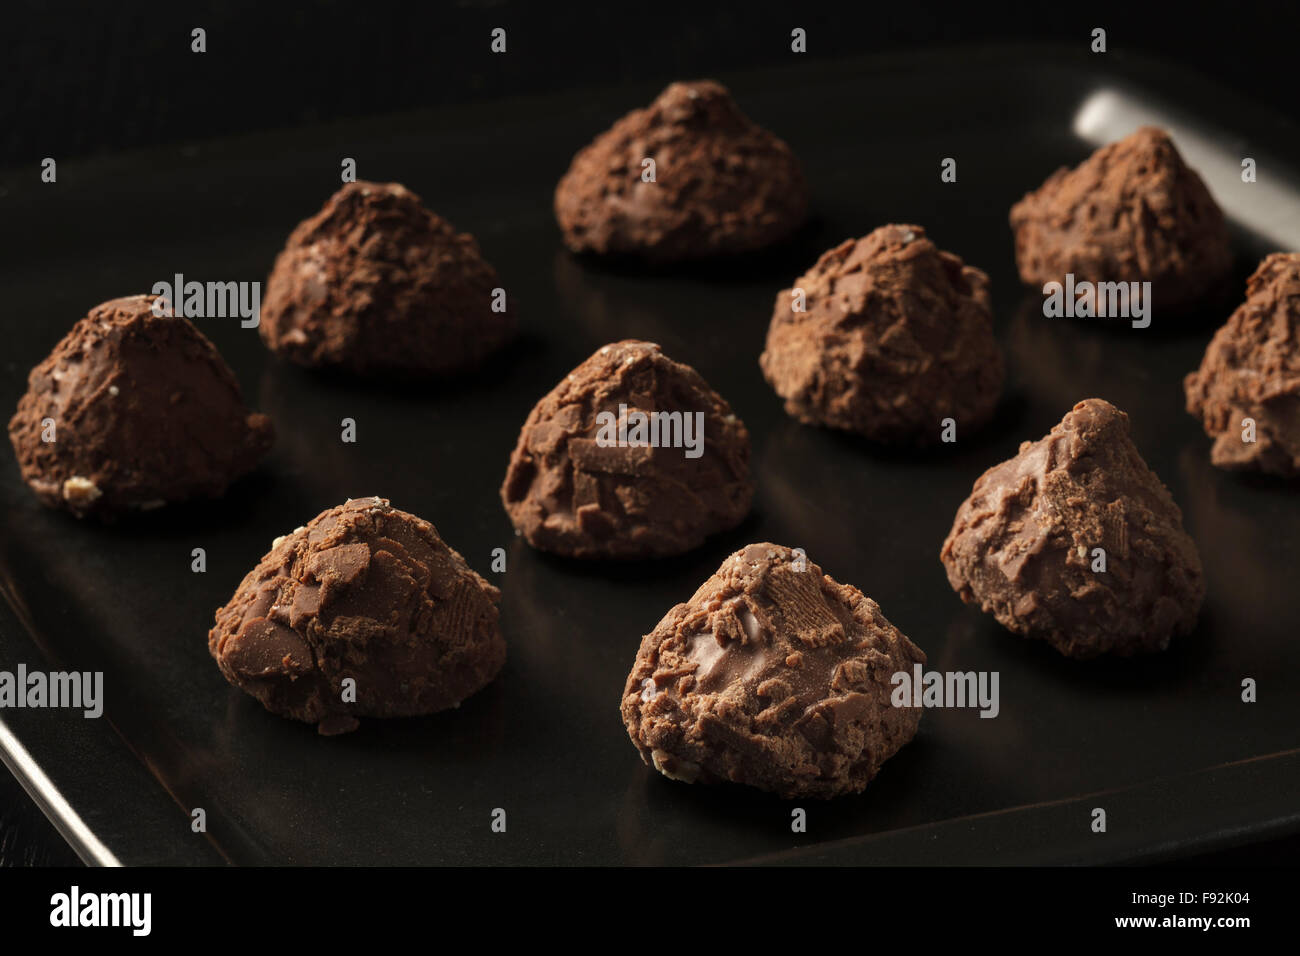 Chocolate truffles - Stock Image